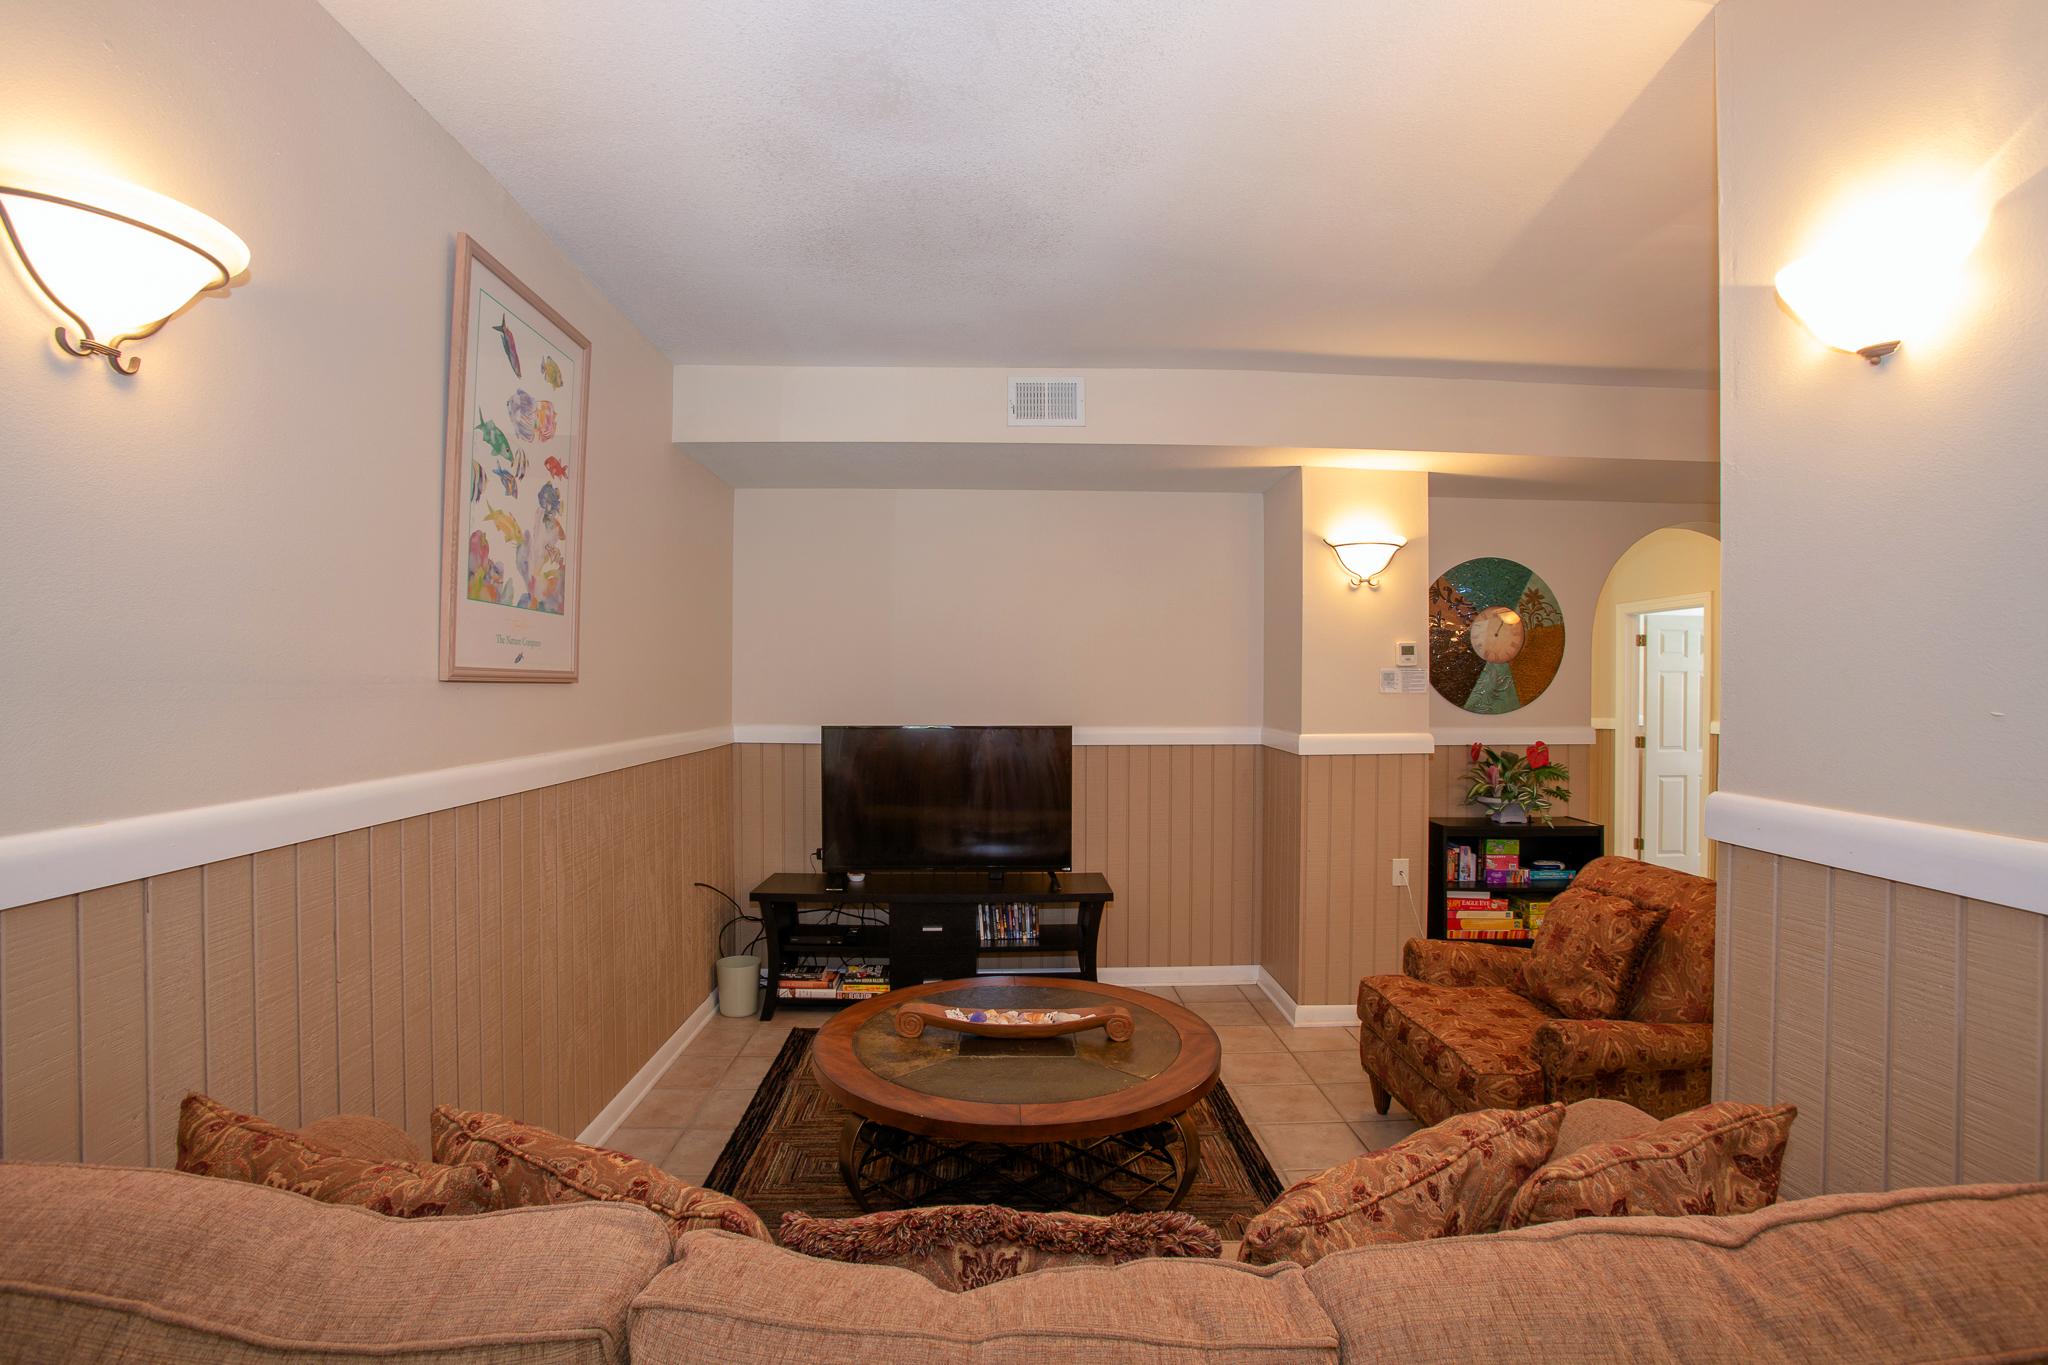 Maldonado 1015 - Sea the Big Picture House/Cottage rental in Pensacola Beach House Rentals in Pensacola Beach Florida - #21